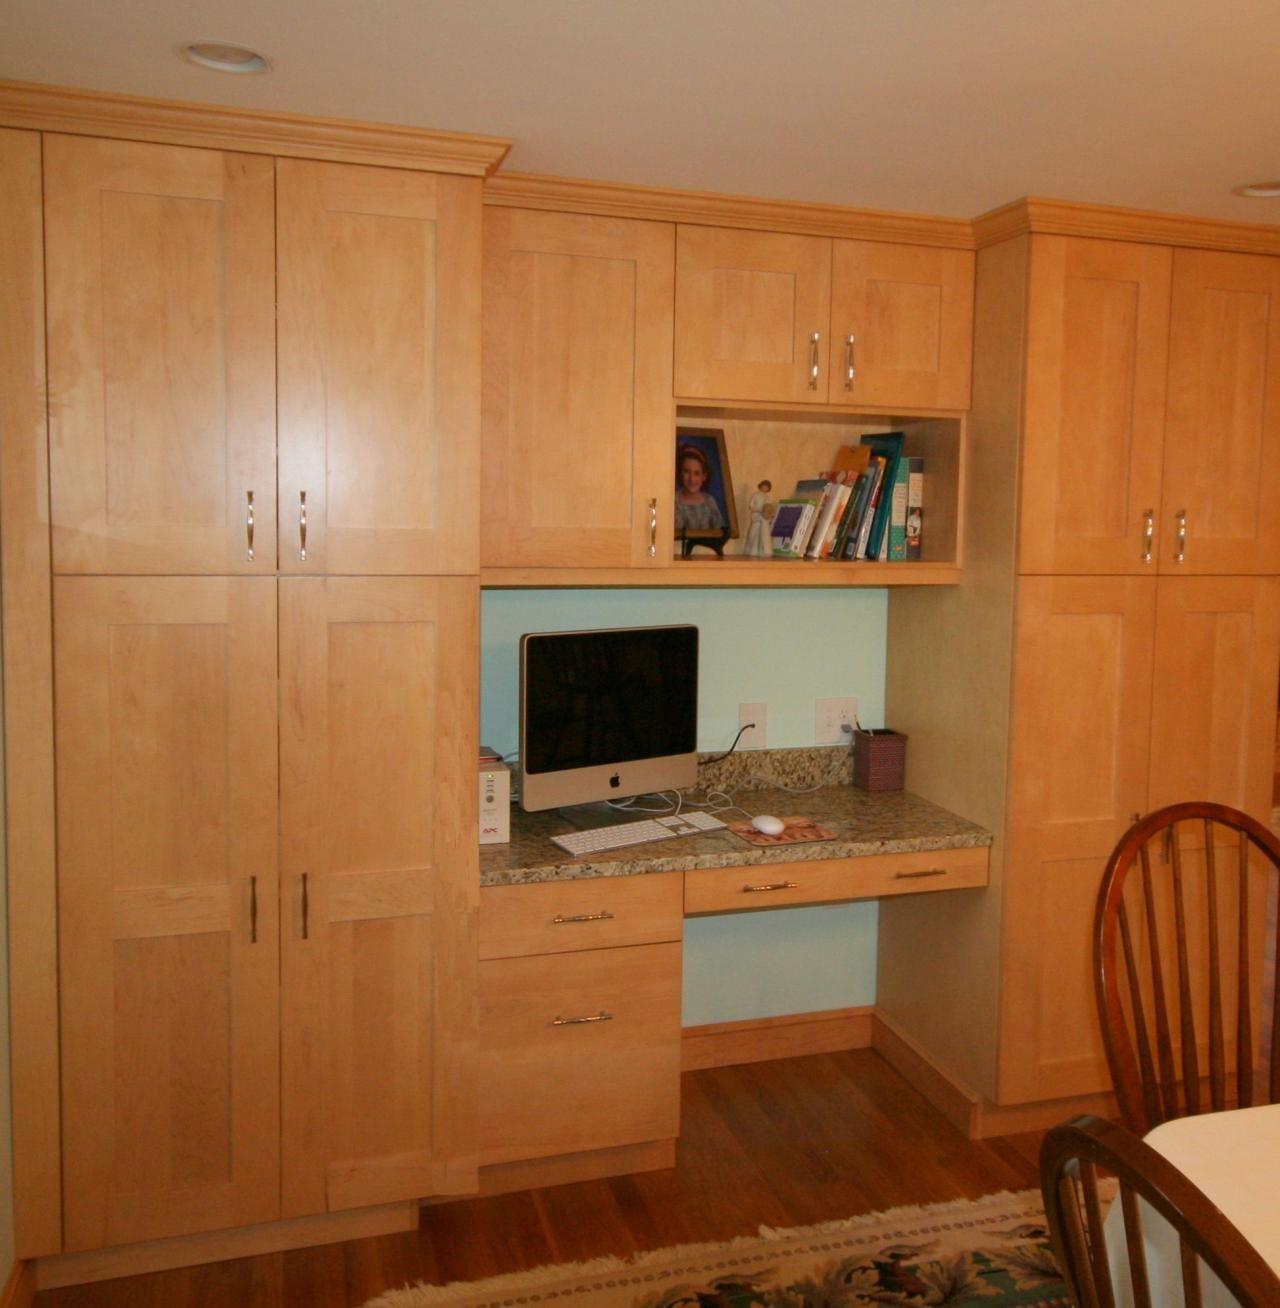 Desk Area Between Pantry Cabinets